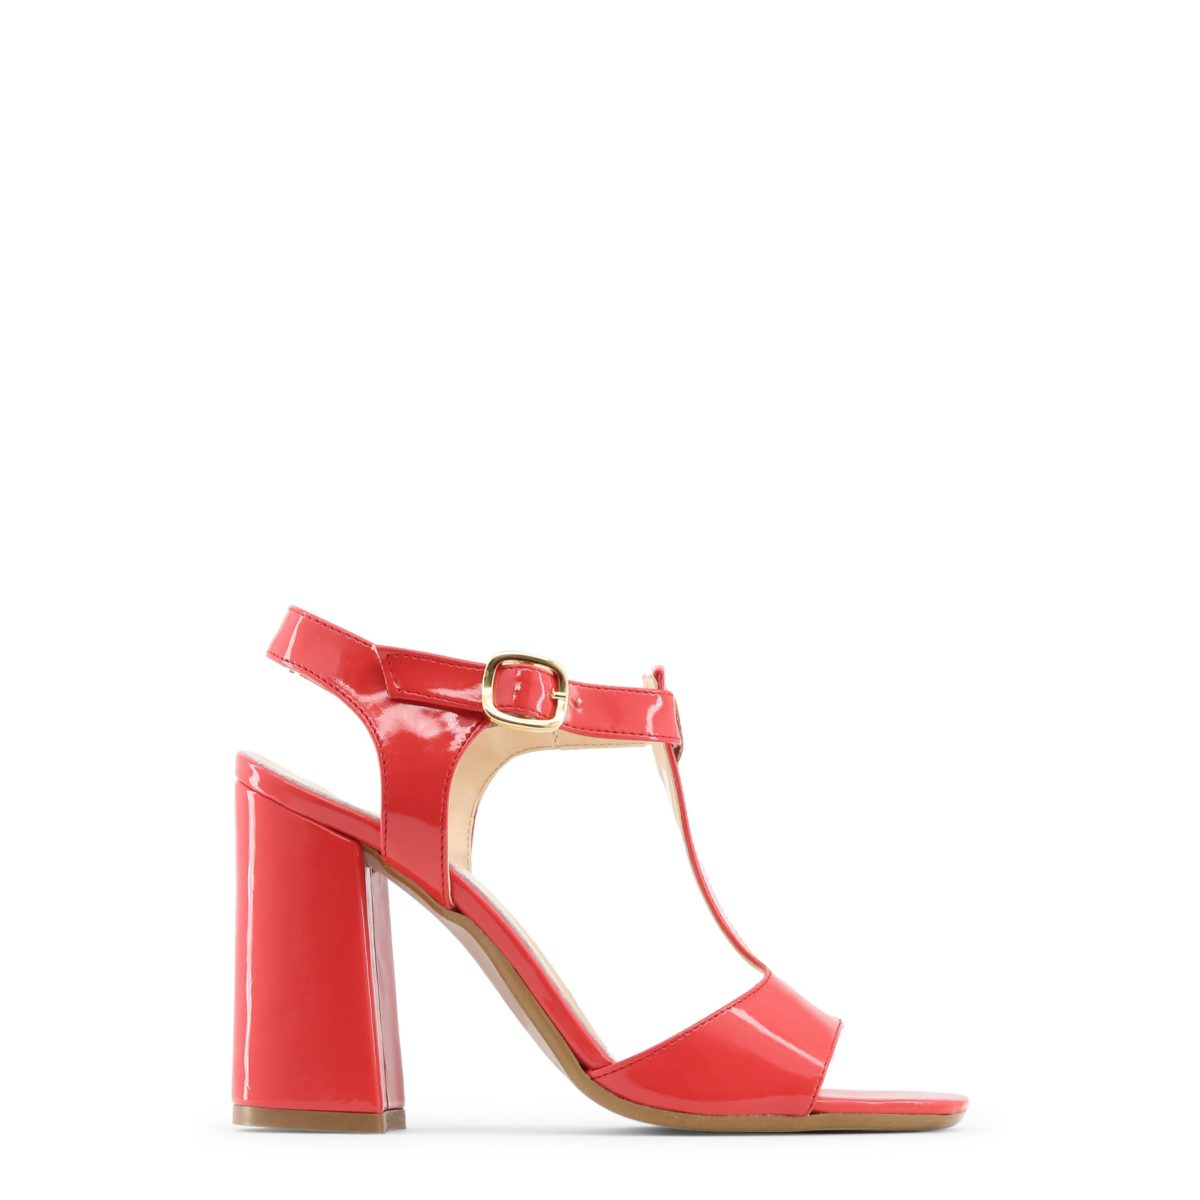 Escarpins à bride talon épais en cuir rouge Made in Italia Buzzao